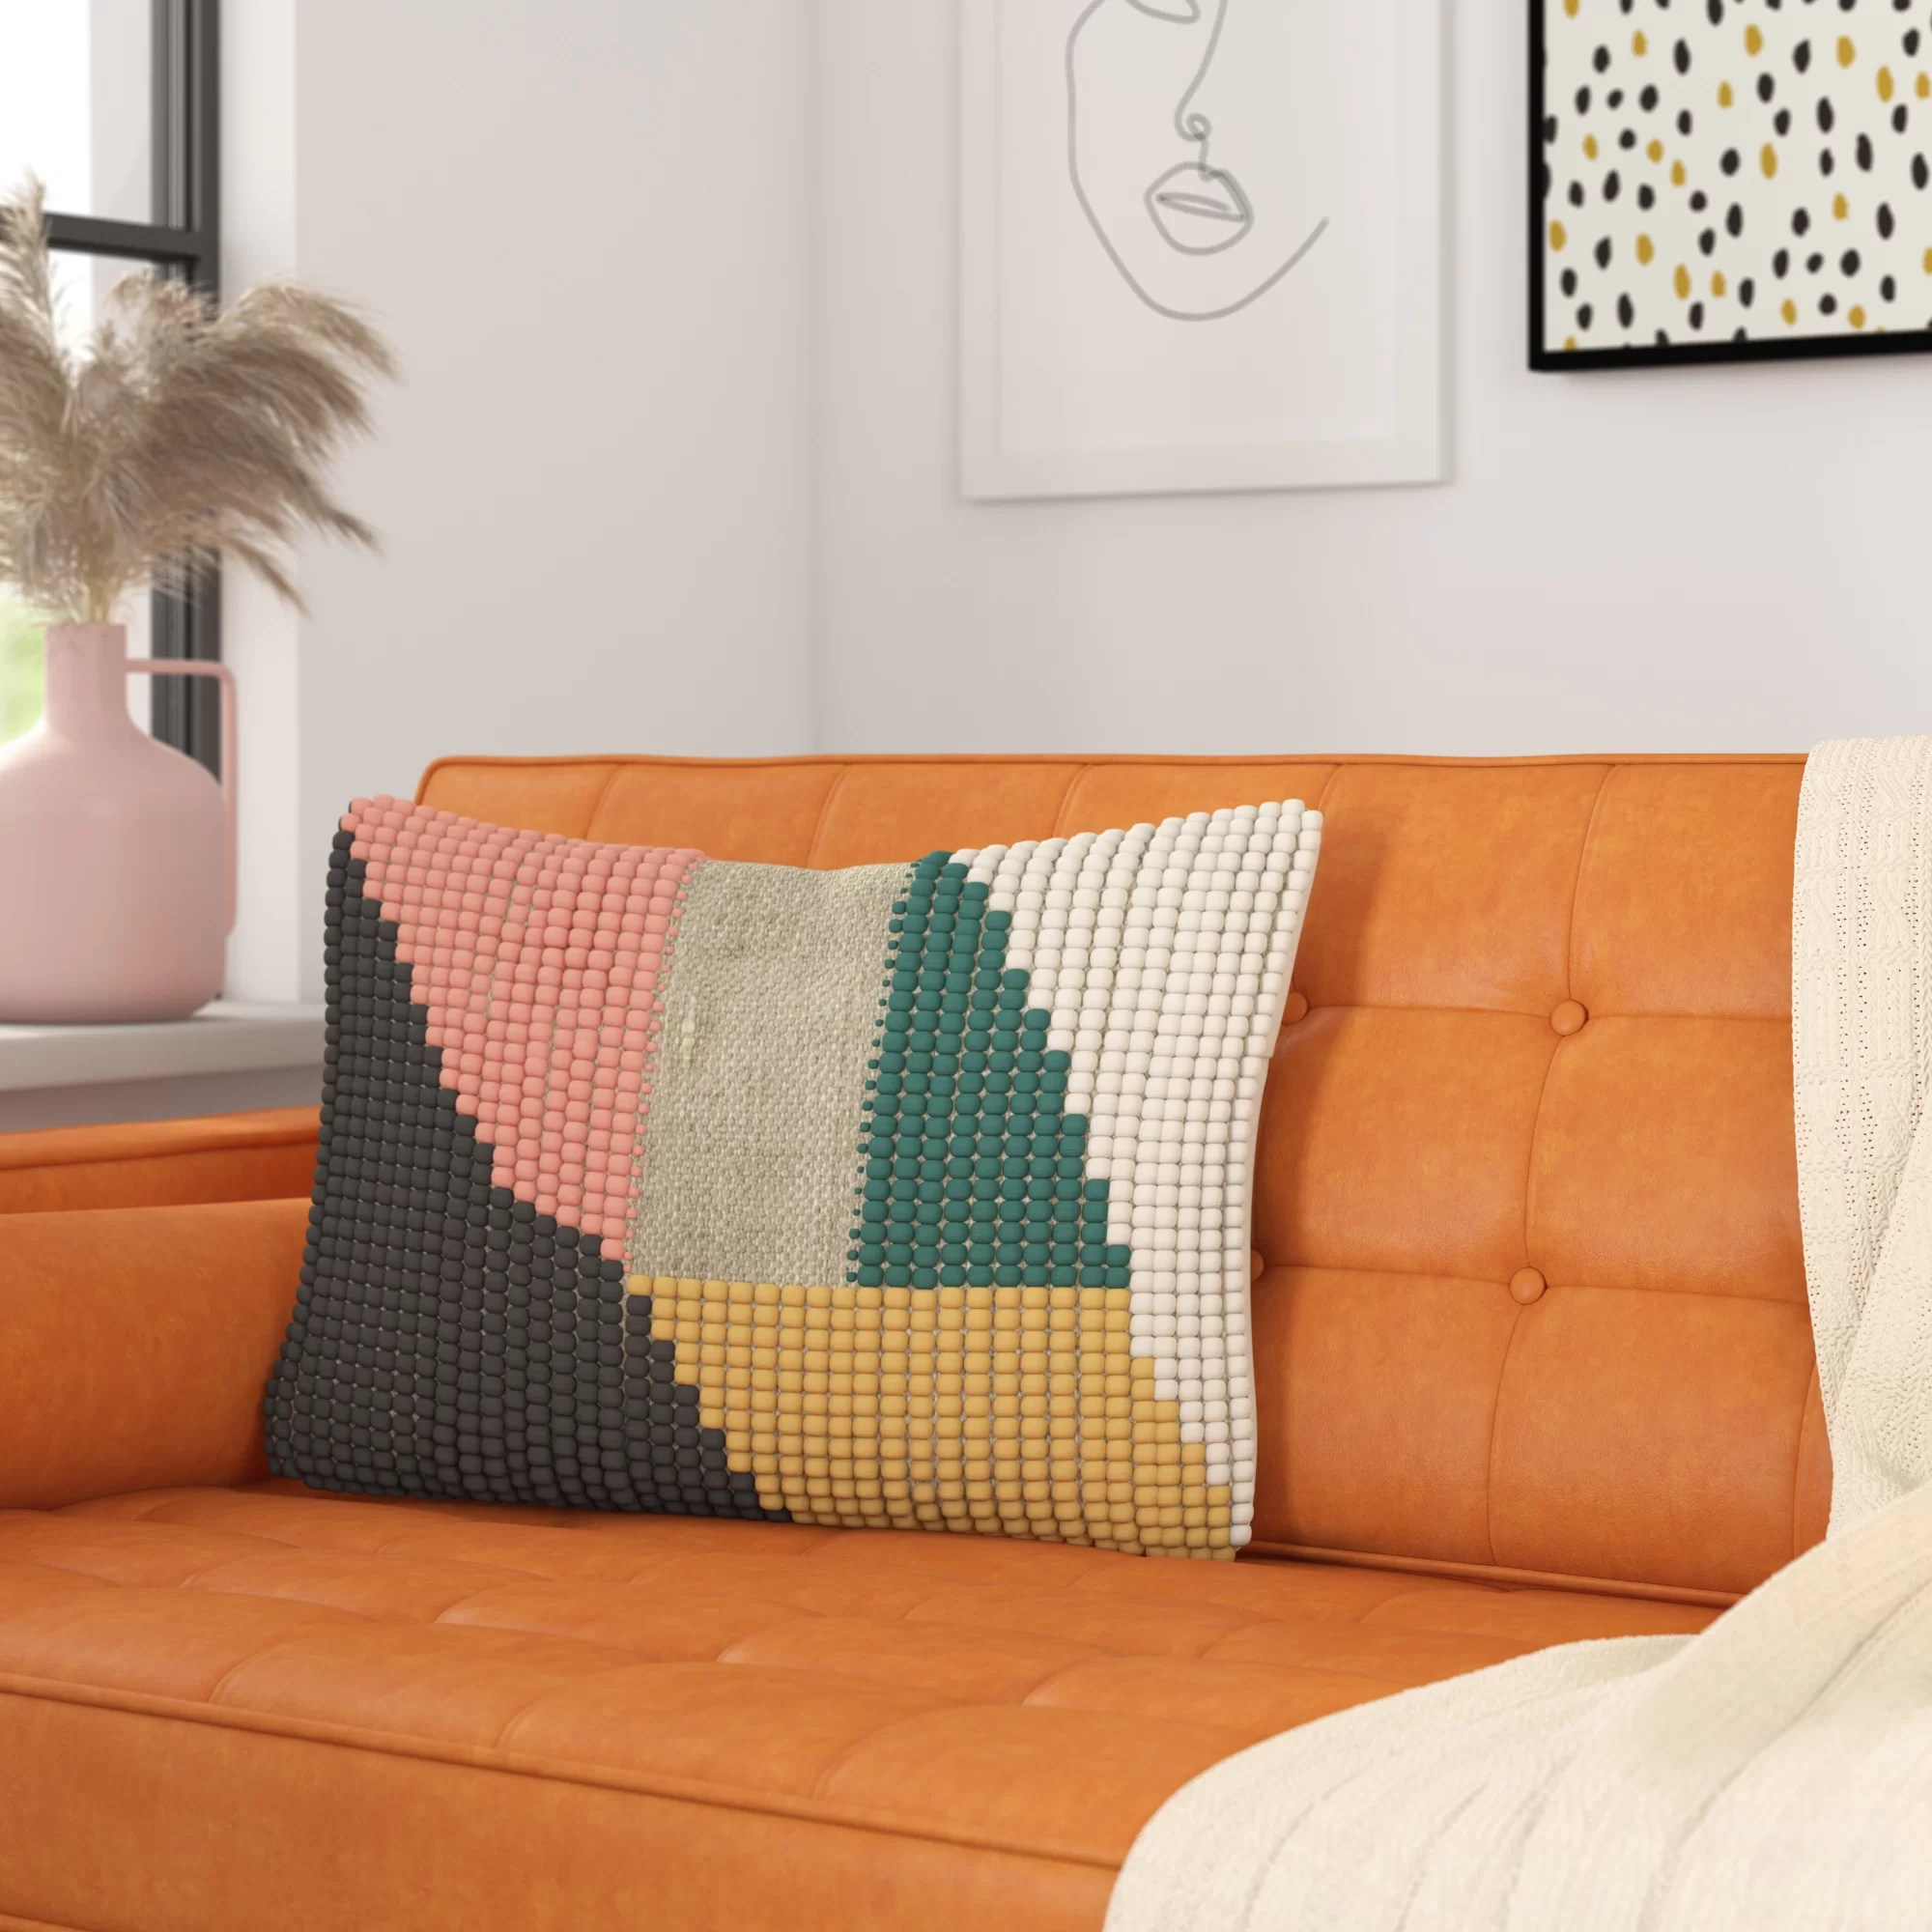 Mid Century Modern Throw Pillows You Ll Love In 2020 Wayfair